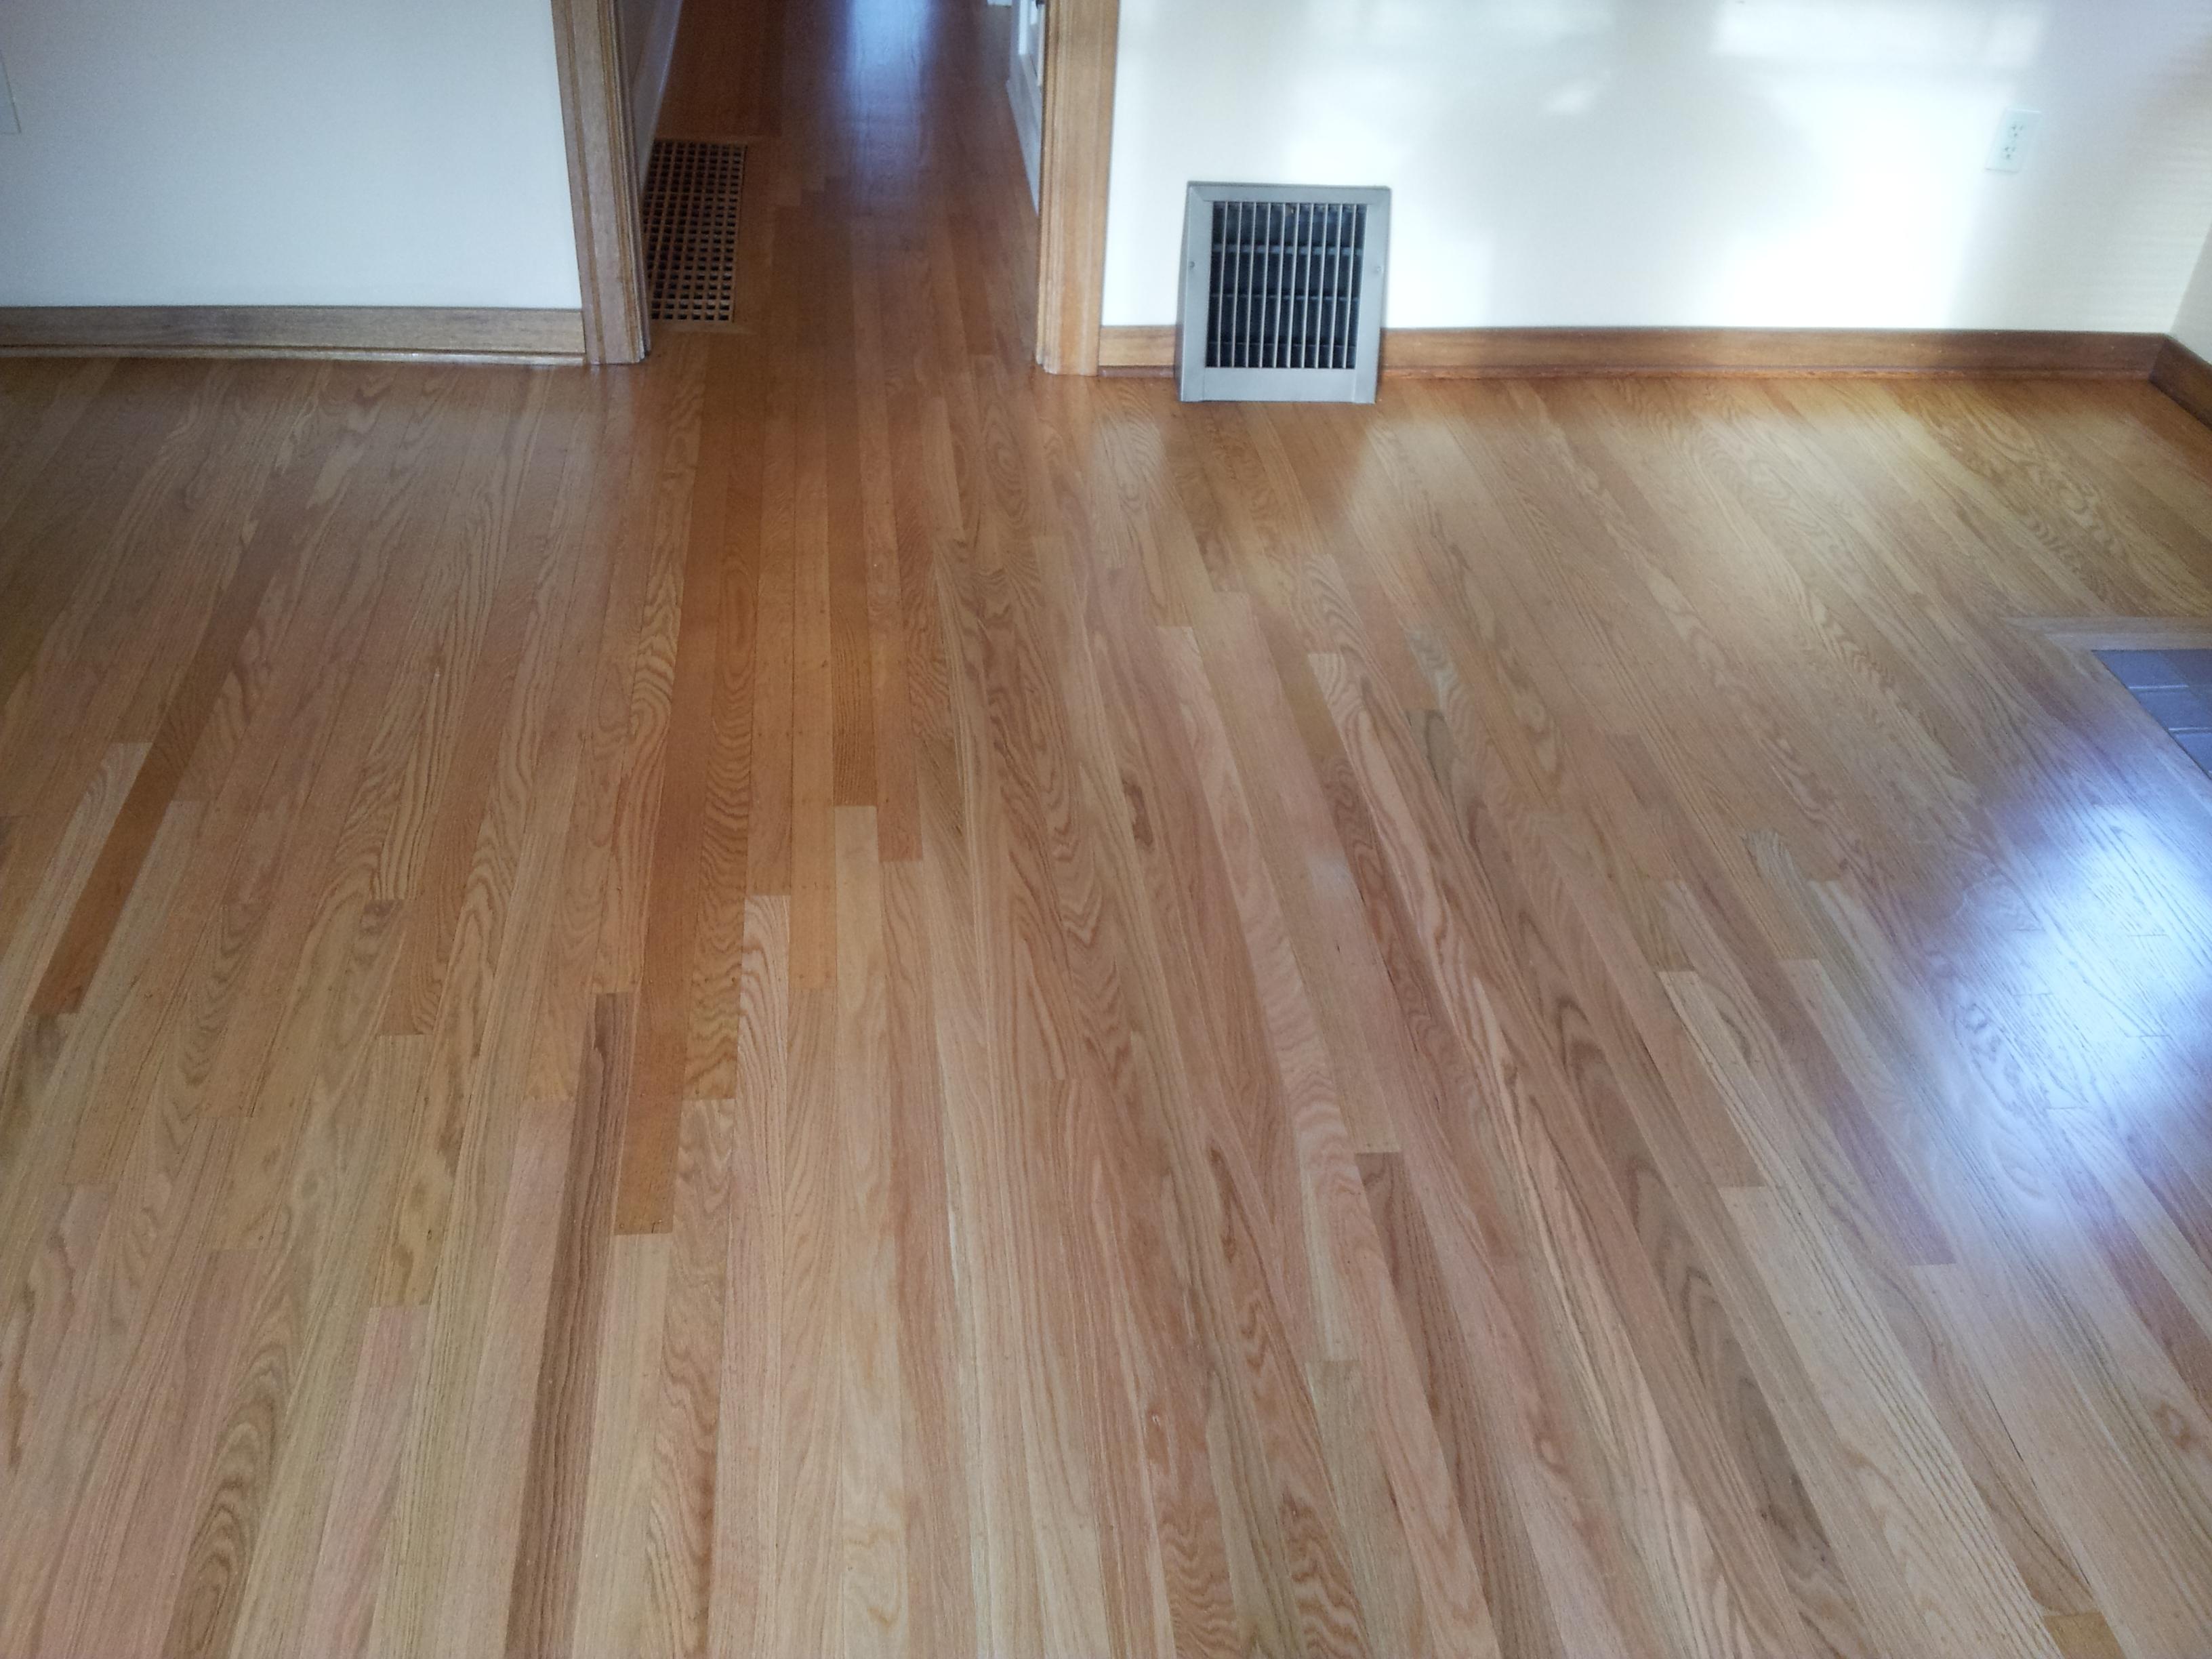 Oak Hardwood Flooring Seattle General Contractor And